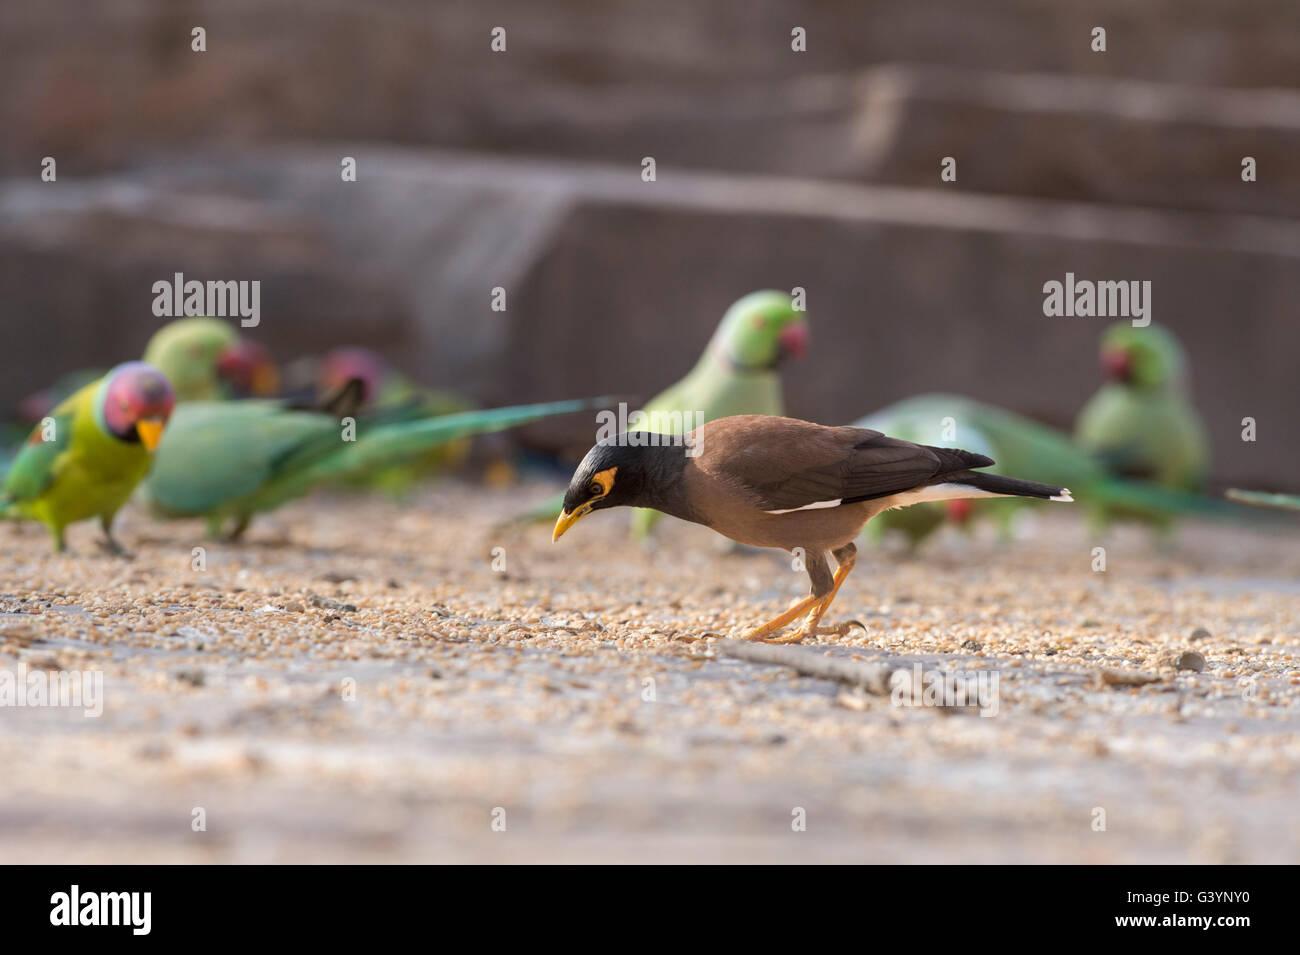 Pájaro Myna Foto de stock